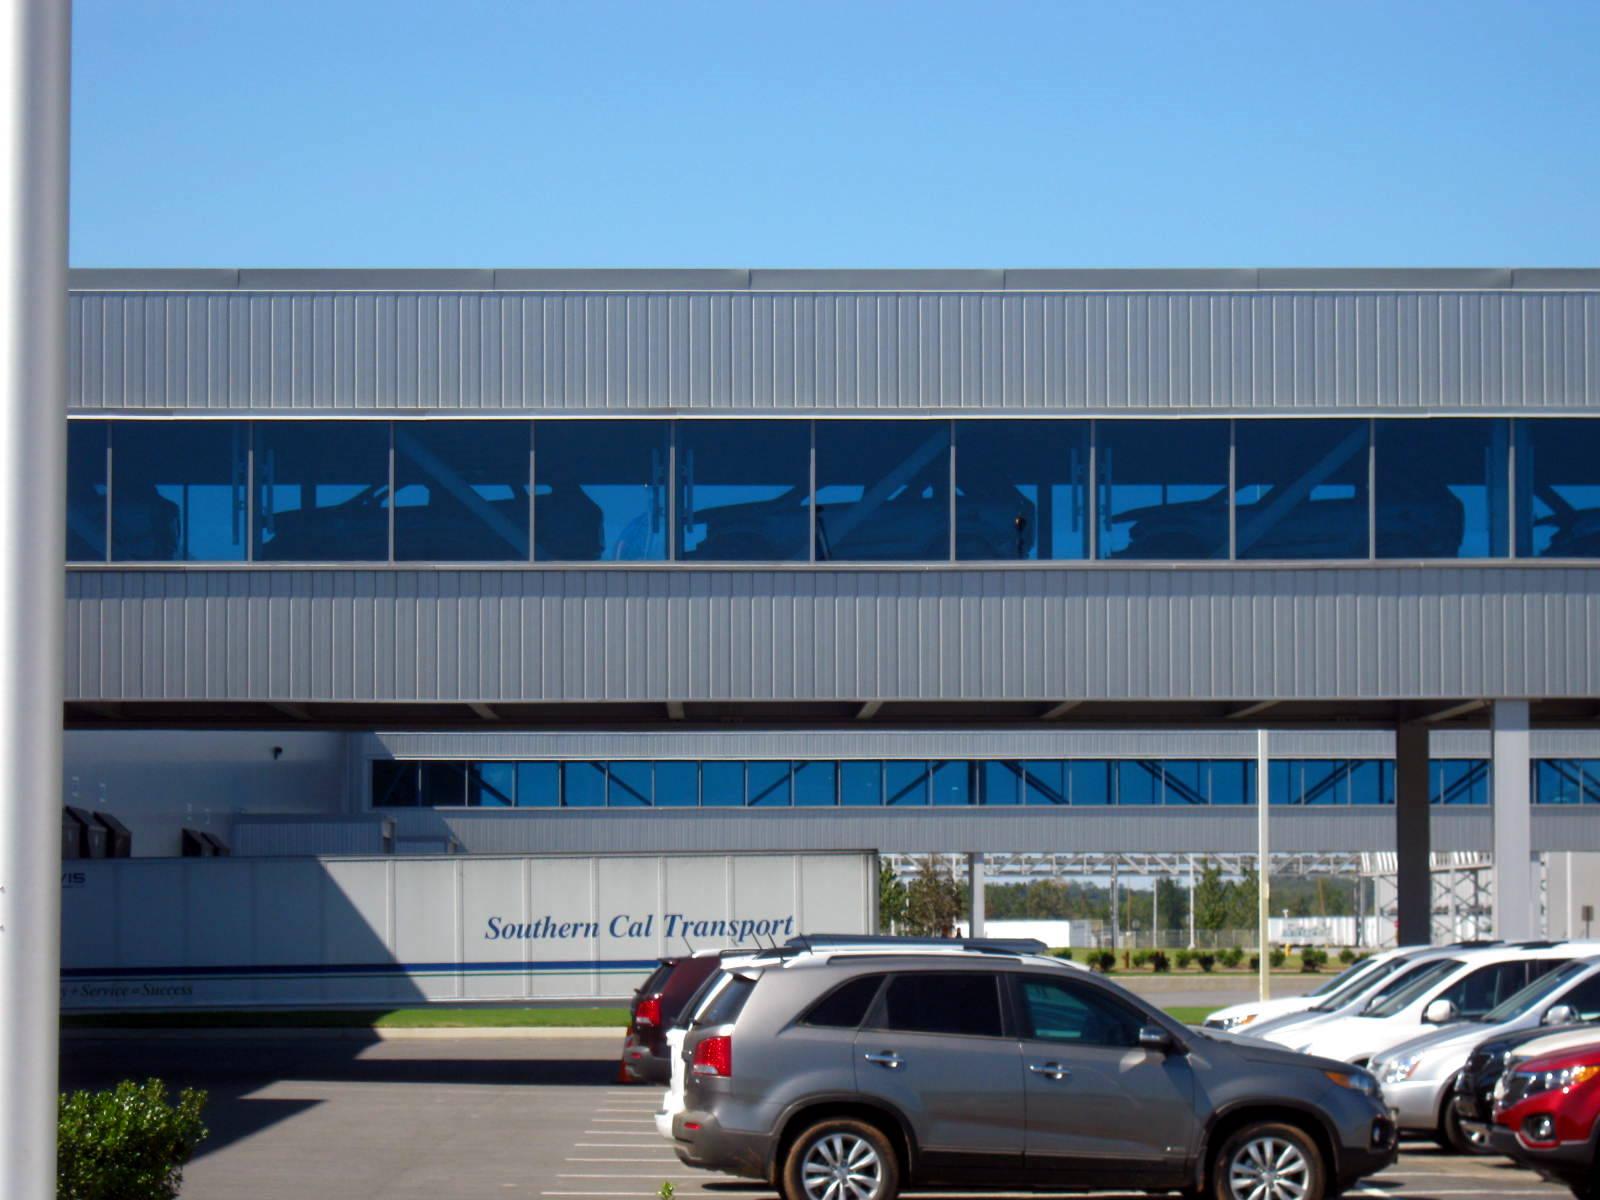 Kia Plant West Point Ga >> RamblerTrek: Kia Assembly/Manufacturing Plant, West Point, GA.; October 5, 2010